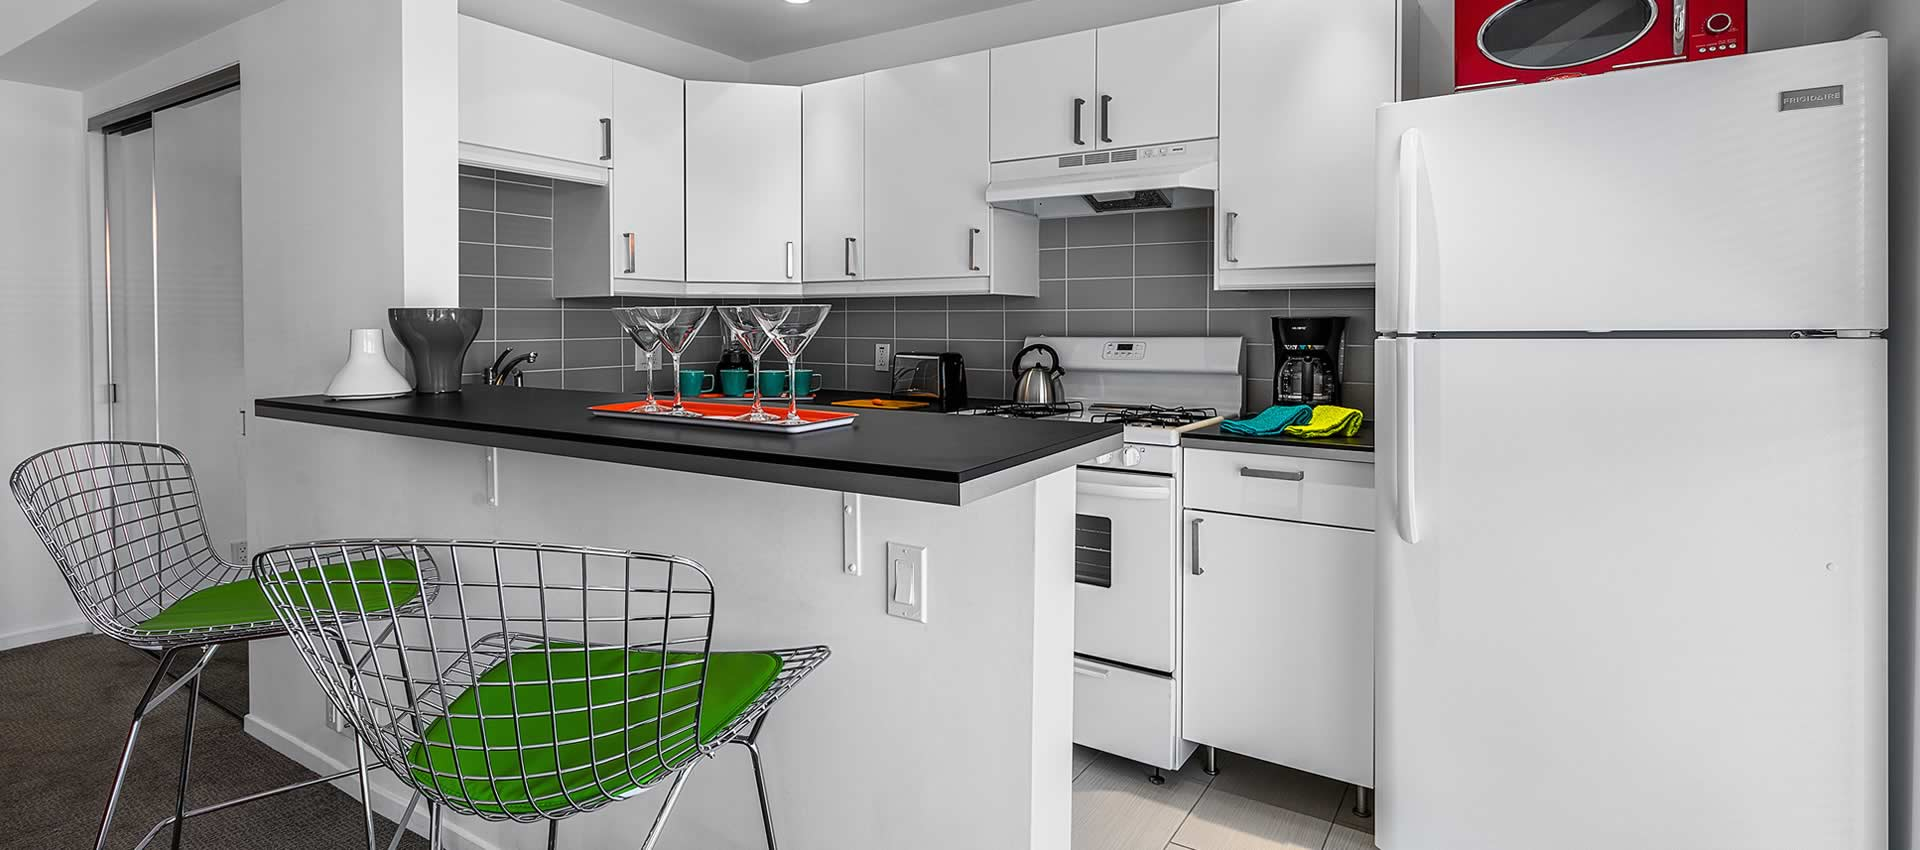 the kitchen of twist hotel room 221